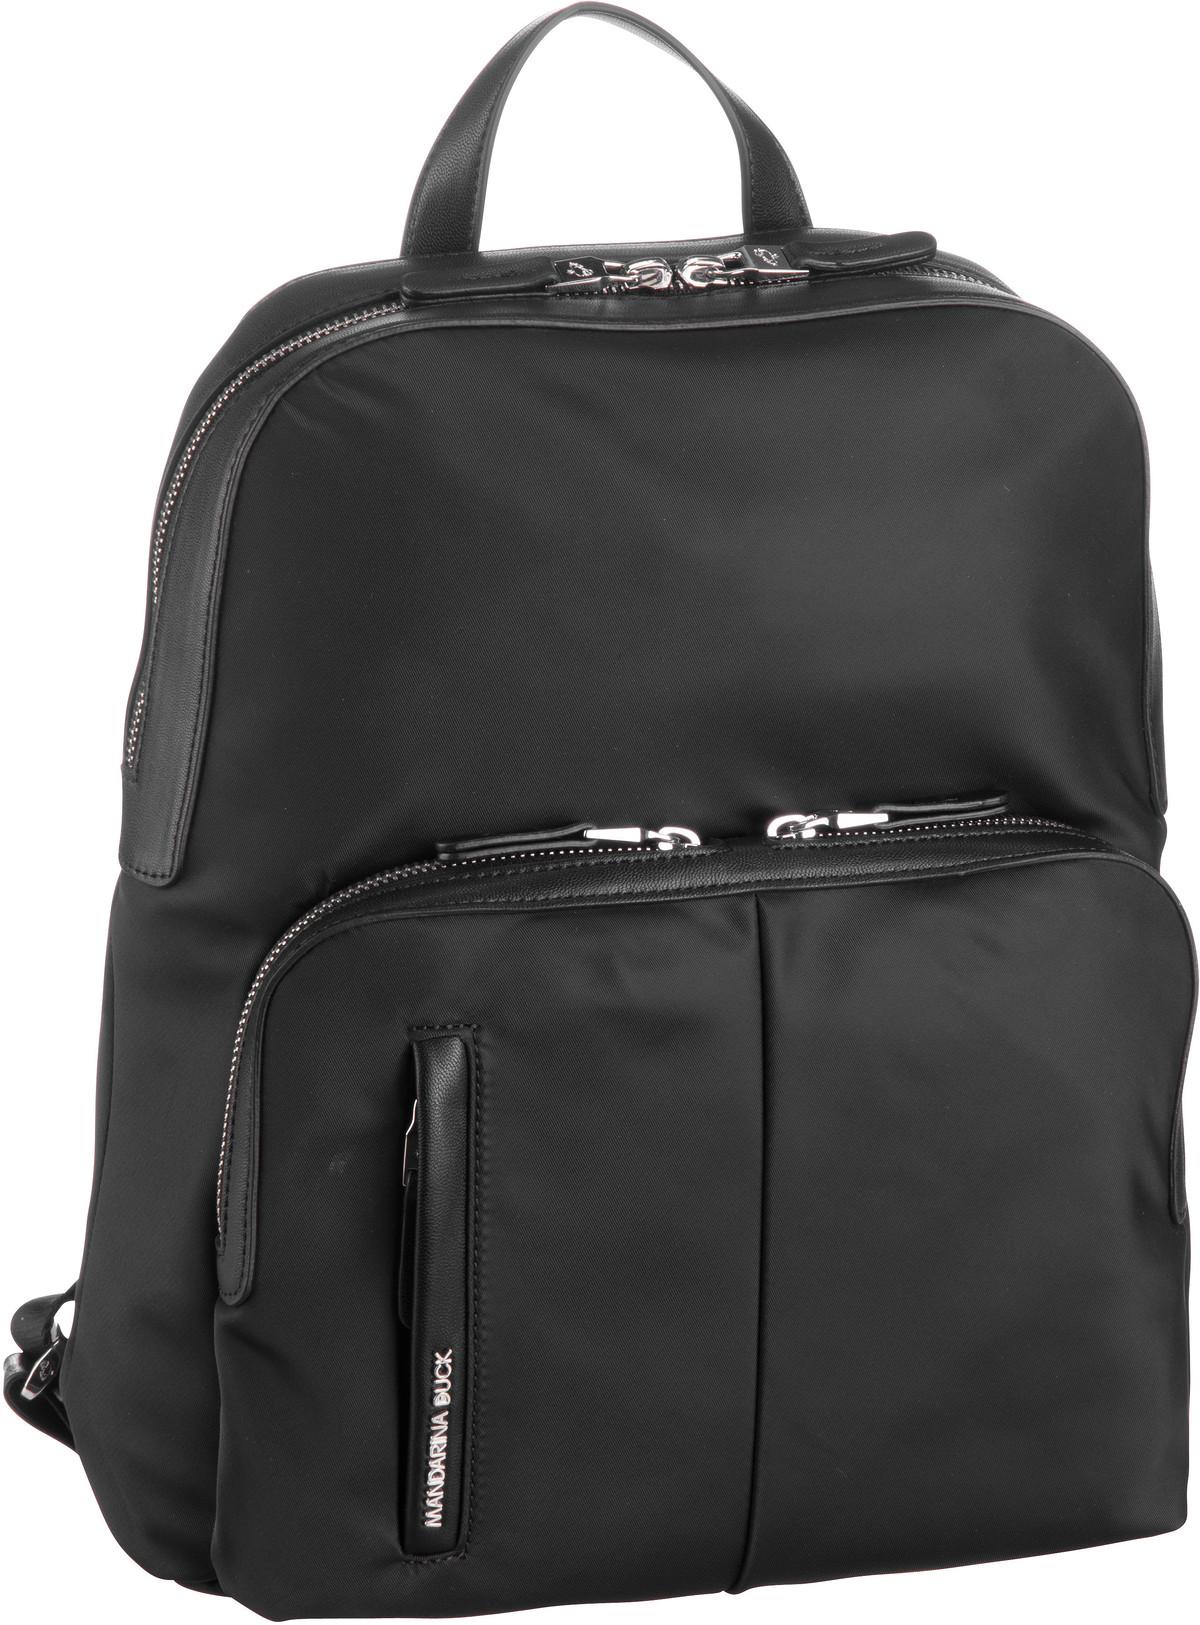 Rucksack / Daypack Hunter Backpack VCT09 Black